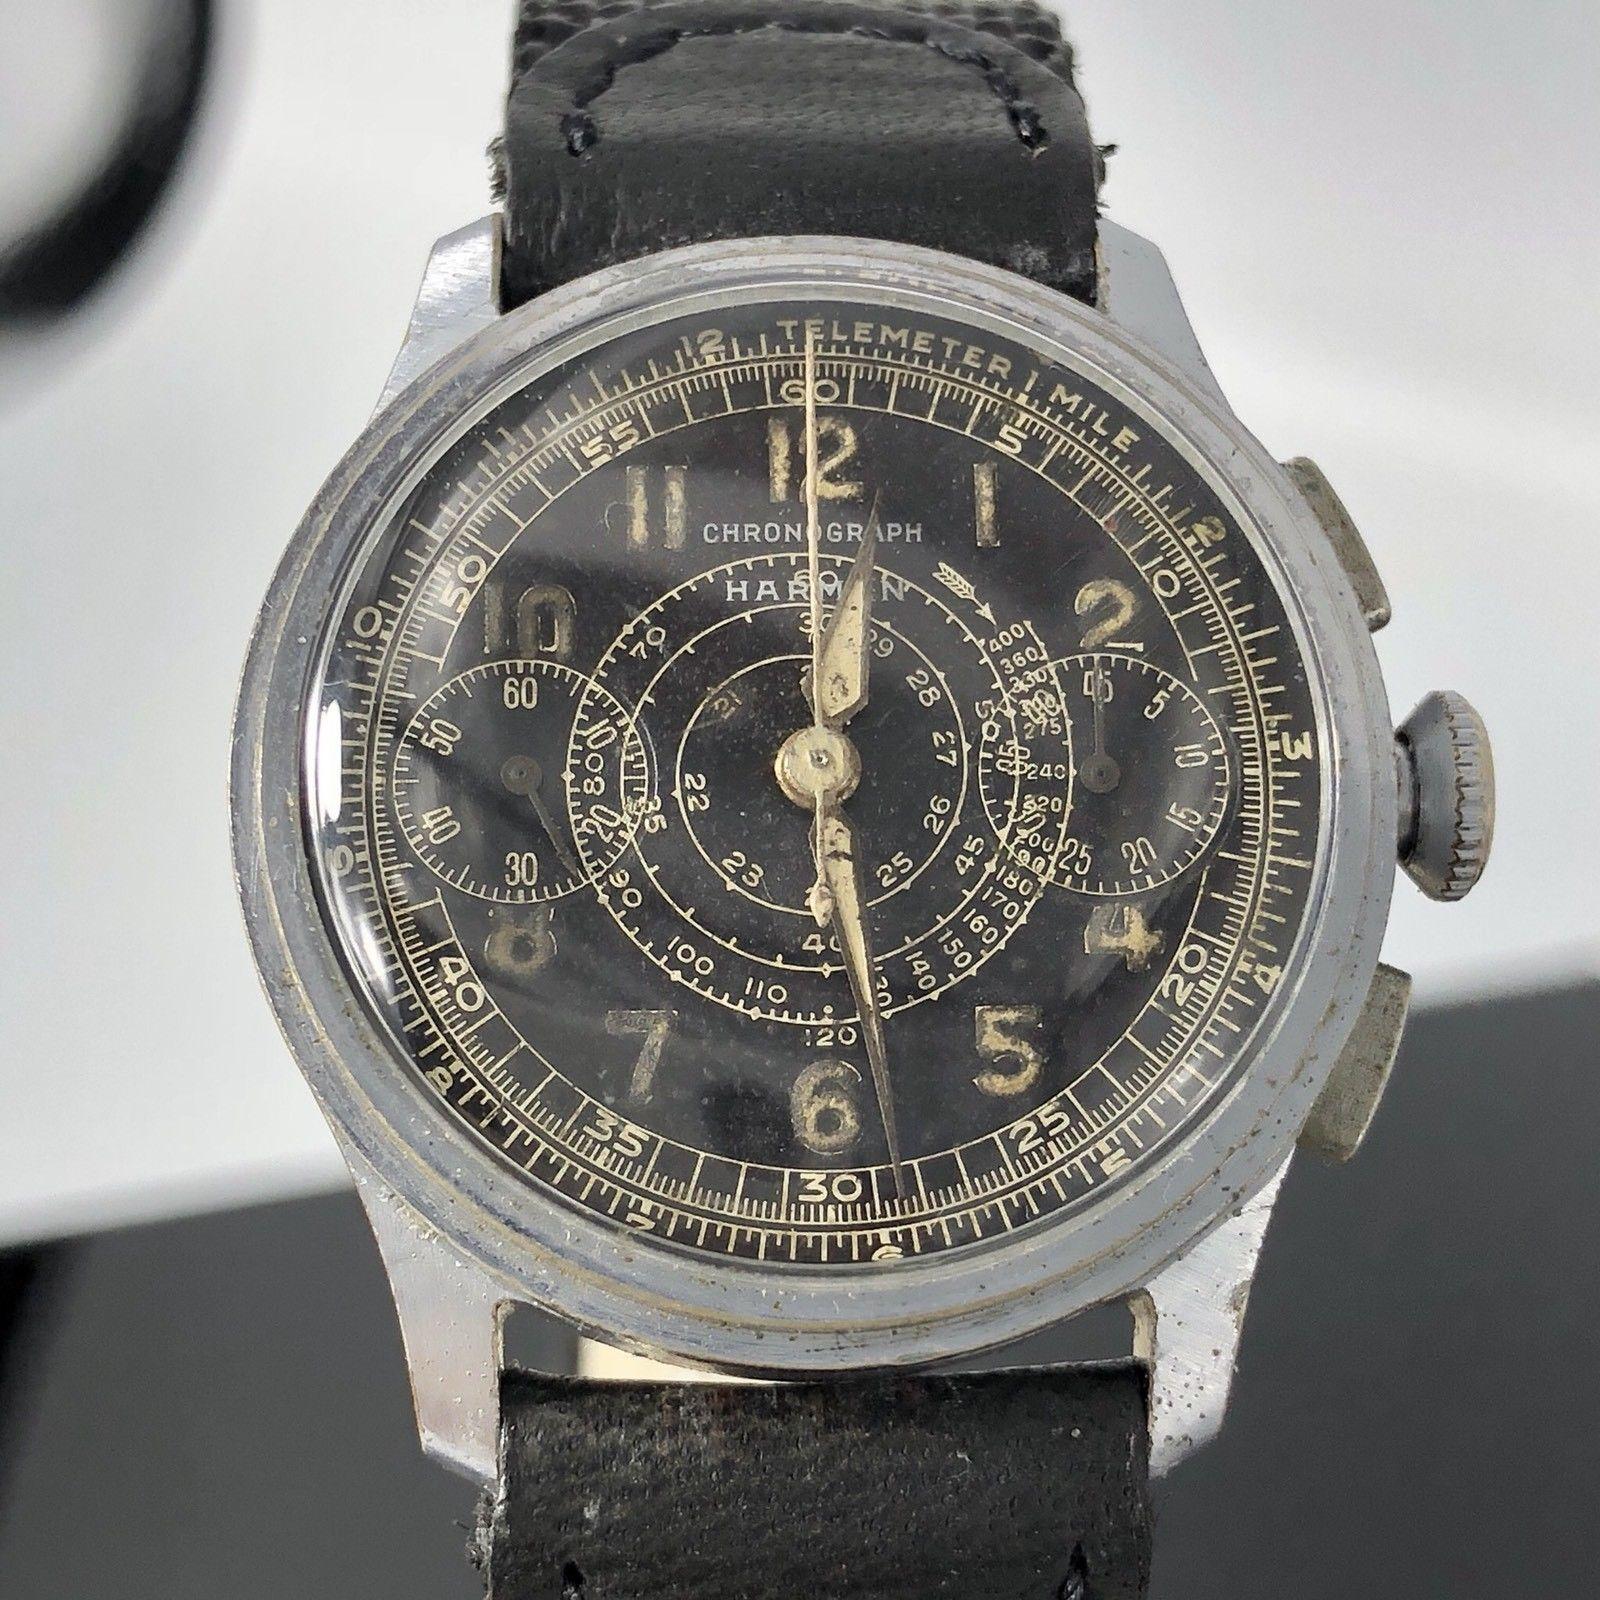 Vintage rare Harman Watch Company Chronograph military watch 1940 ...